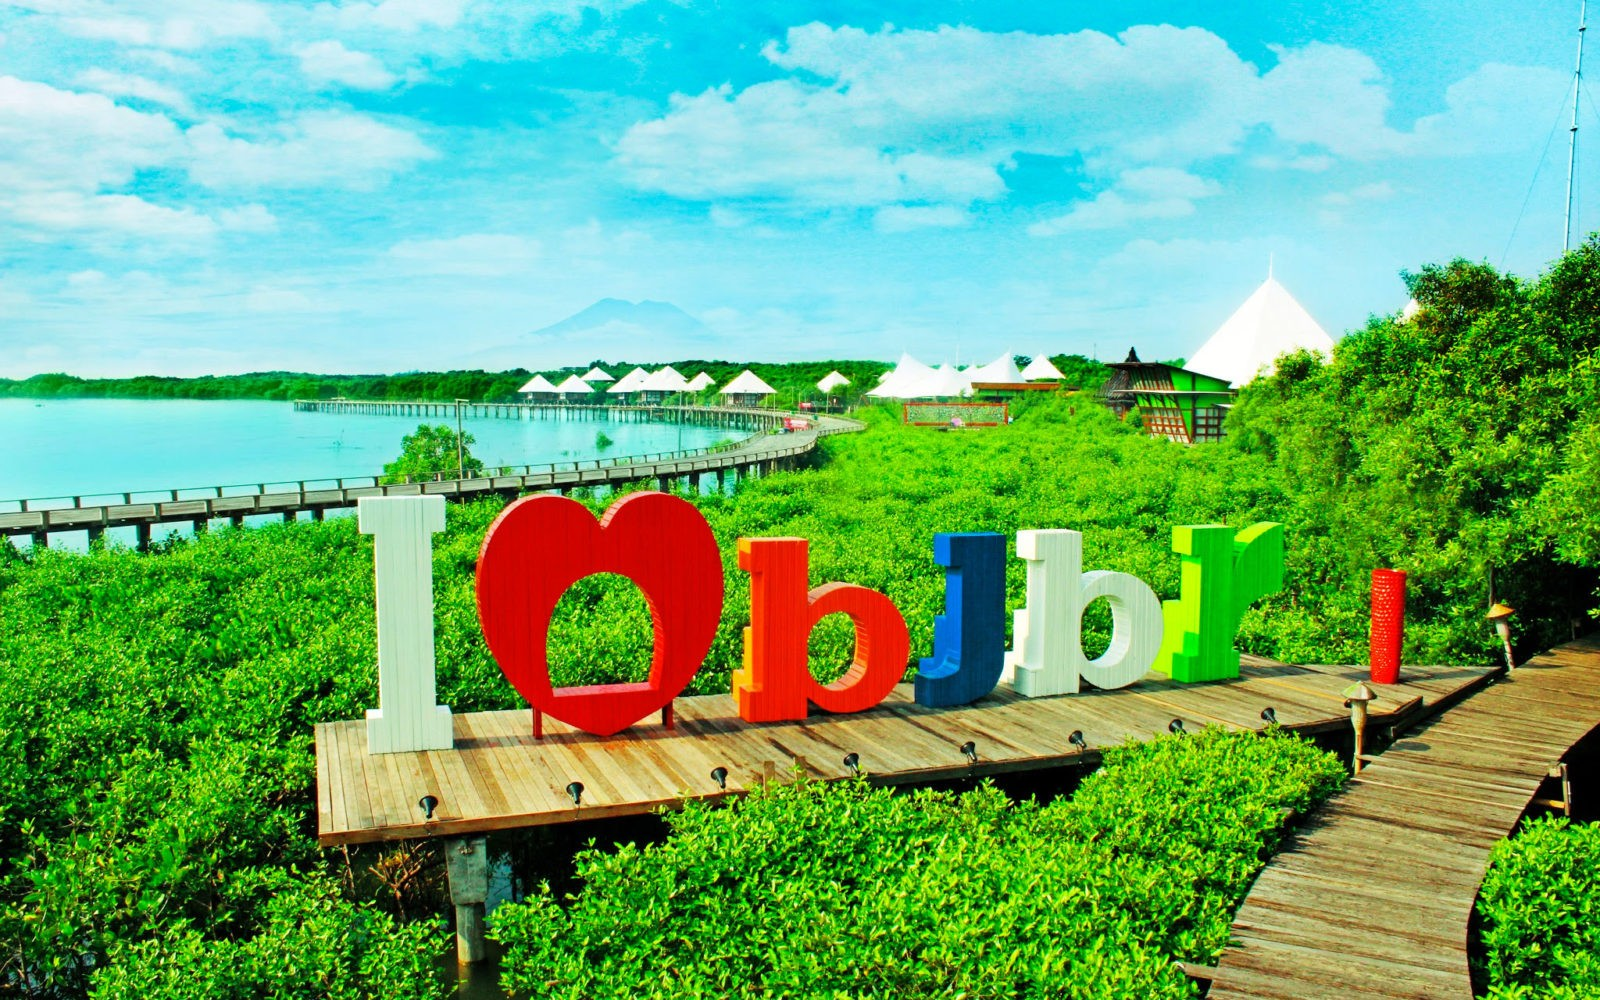 BeeJay Bakau Resort Tiket & 8 Wahana Top November 8 - TravelsPromo